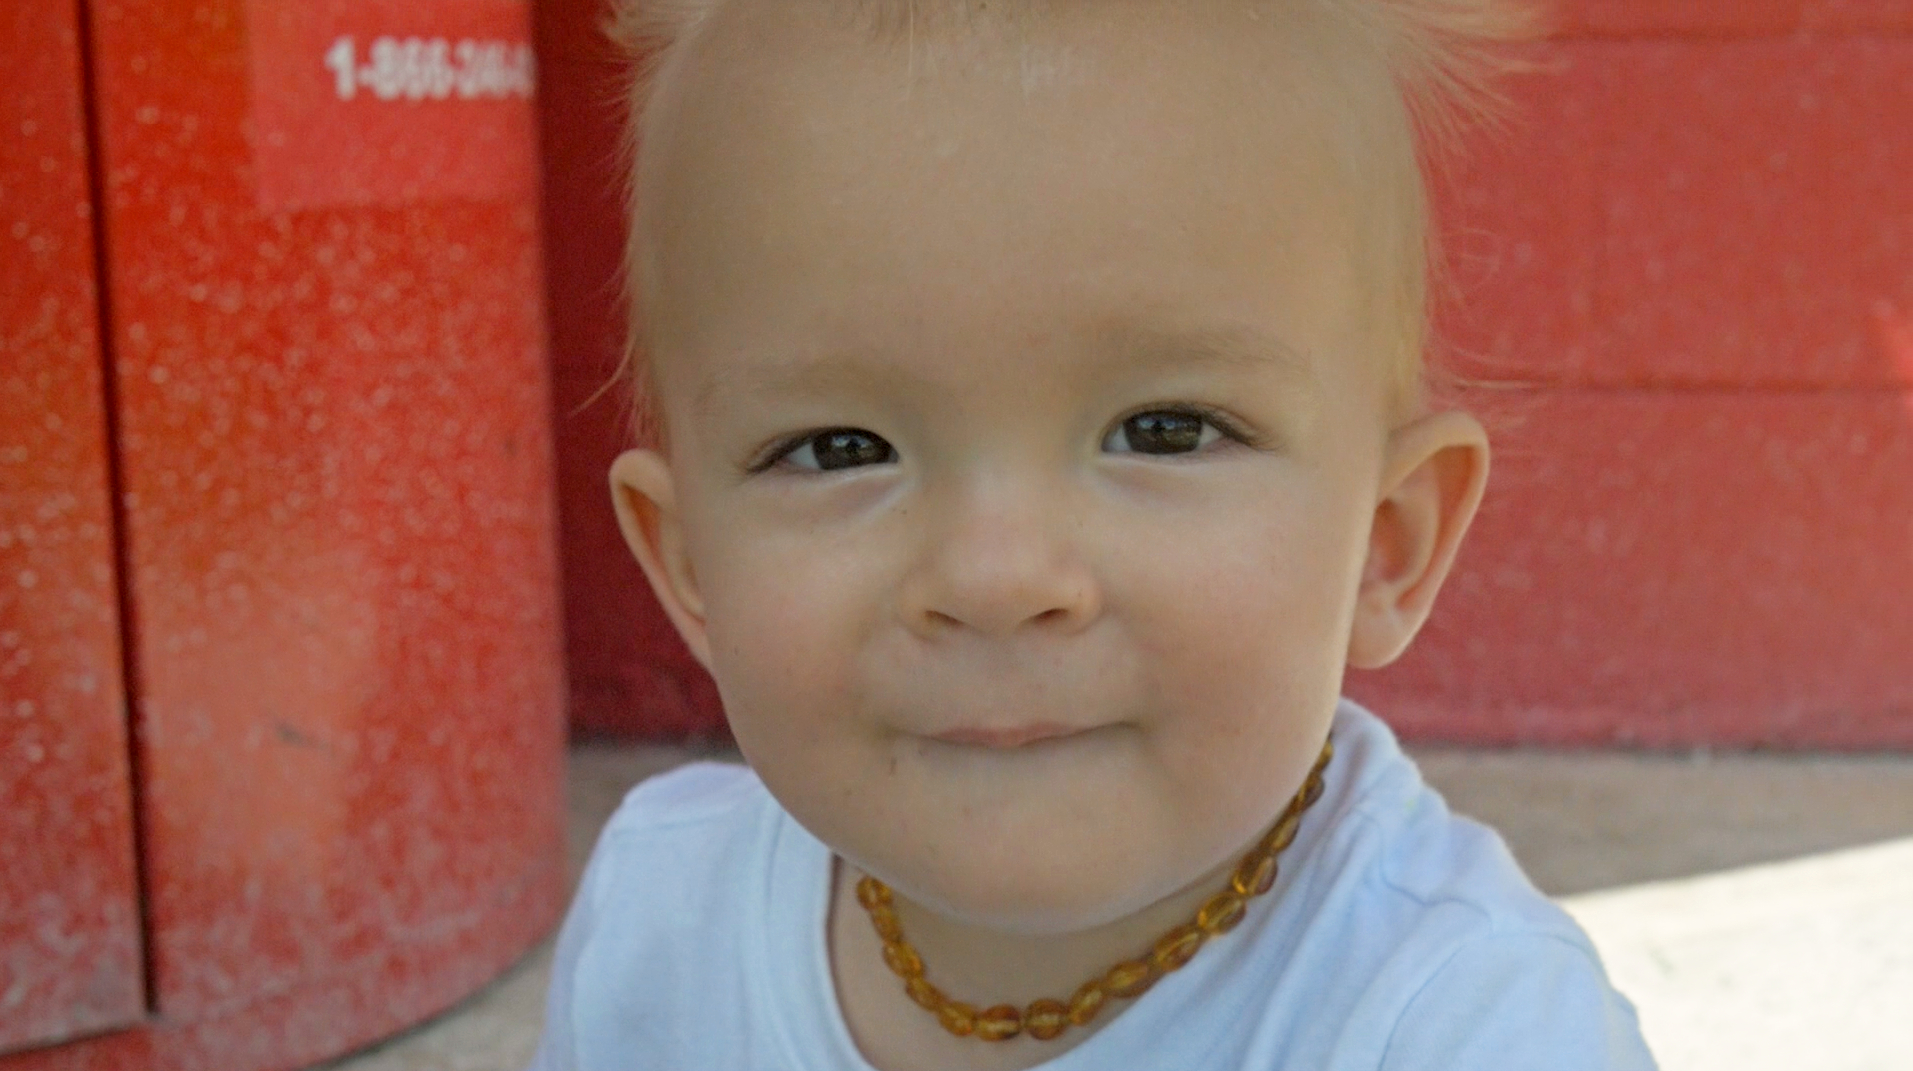 Baby Kid.jpg